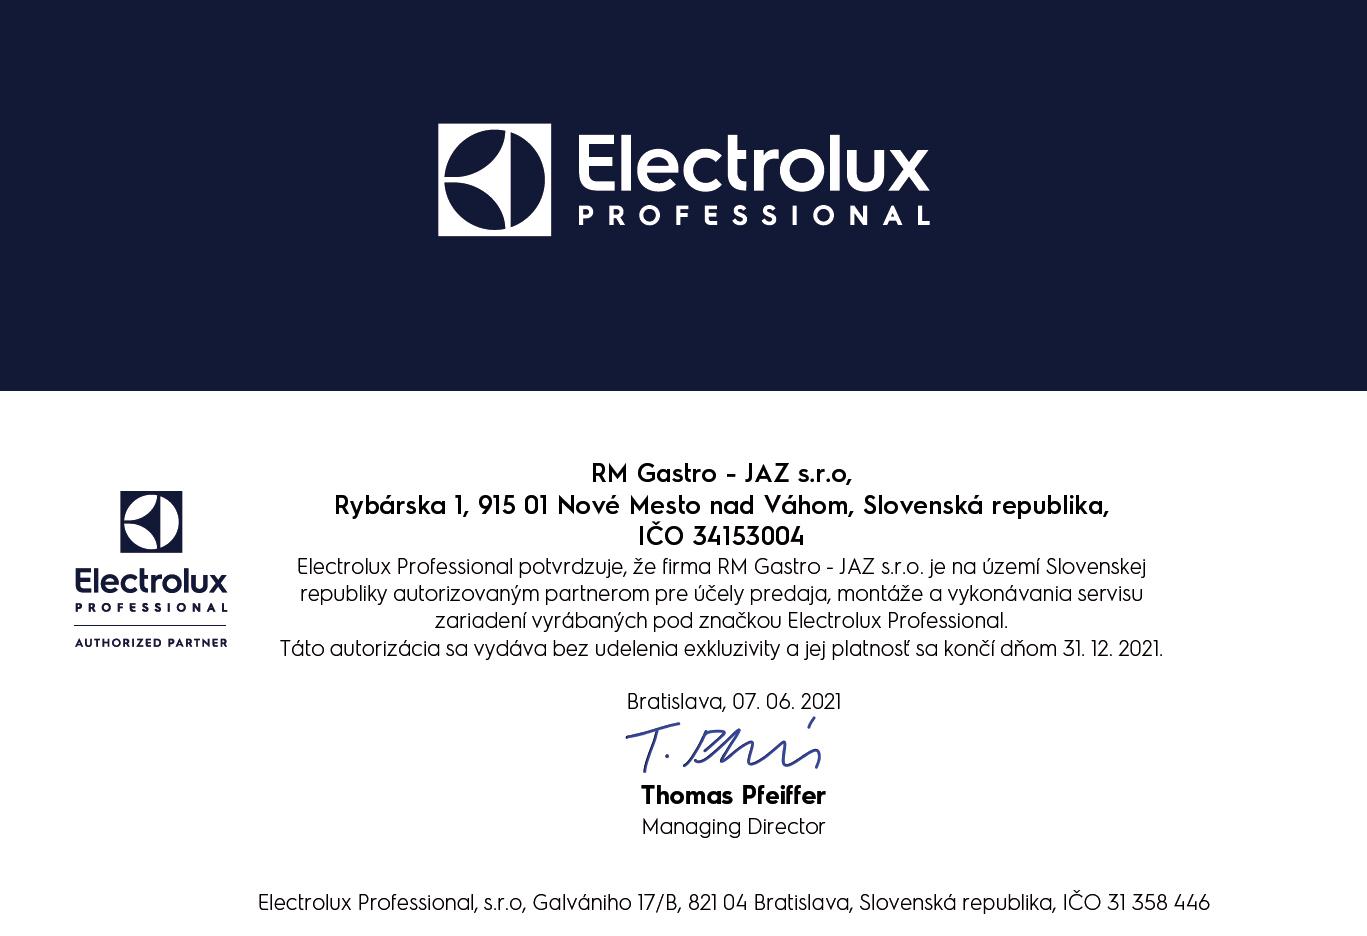 certifikat electrolux